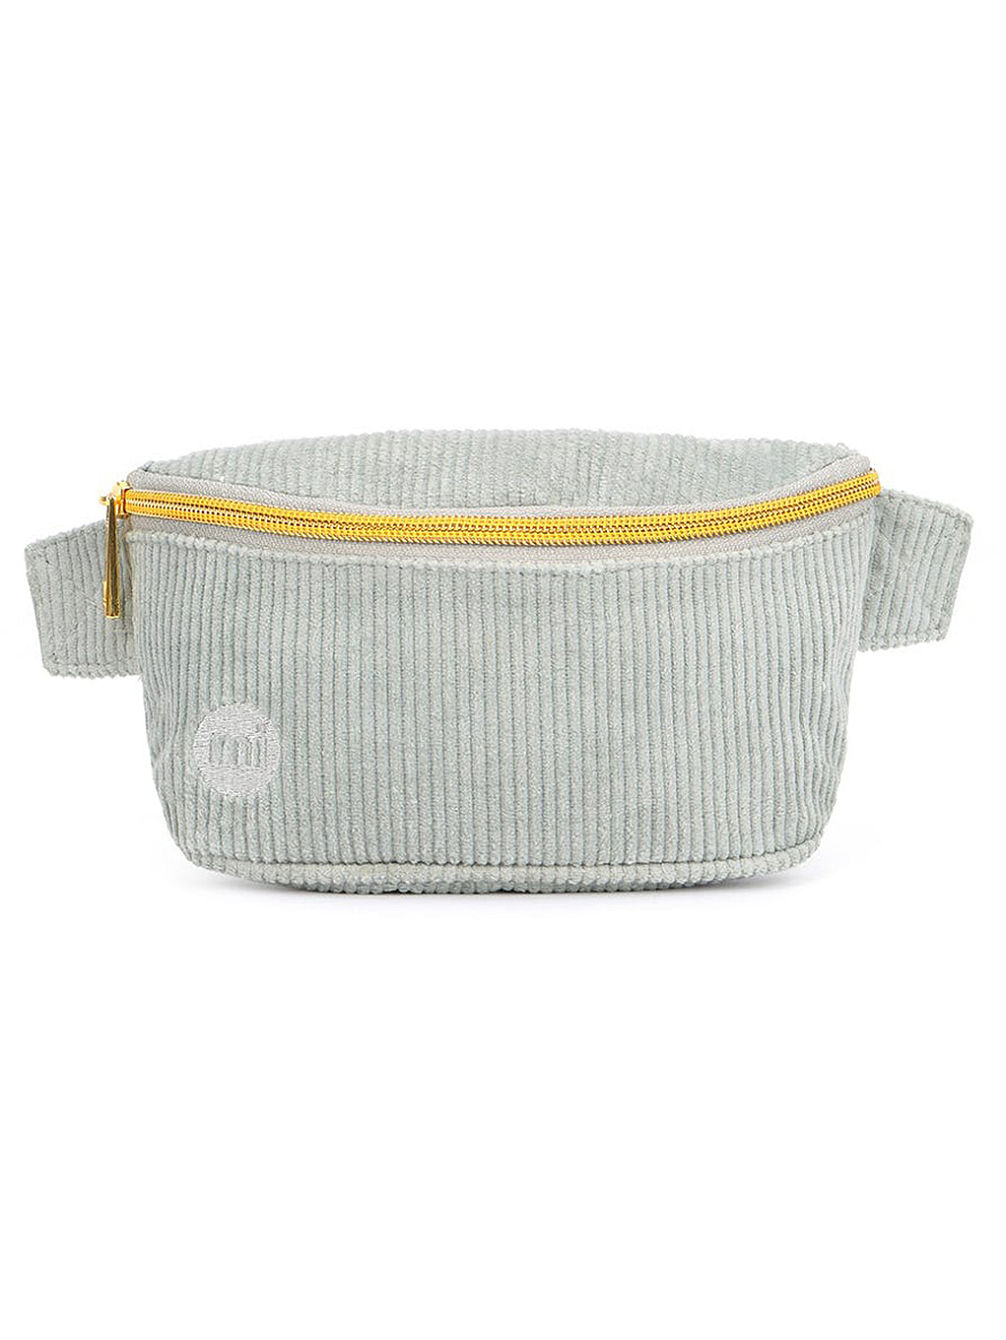 8eb302beb42b0 Buy Mi-Pac Bum Corduroy Bag online at Blue Tomato